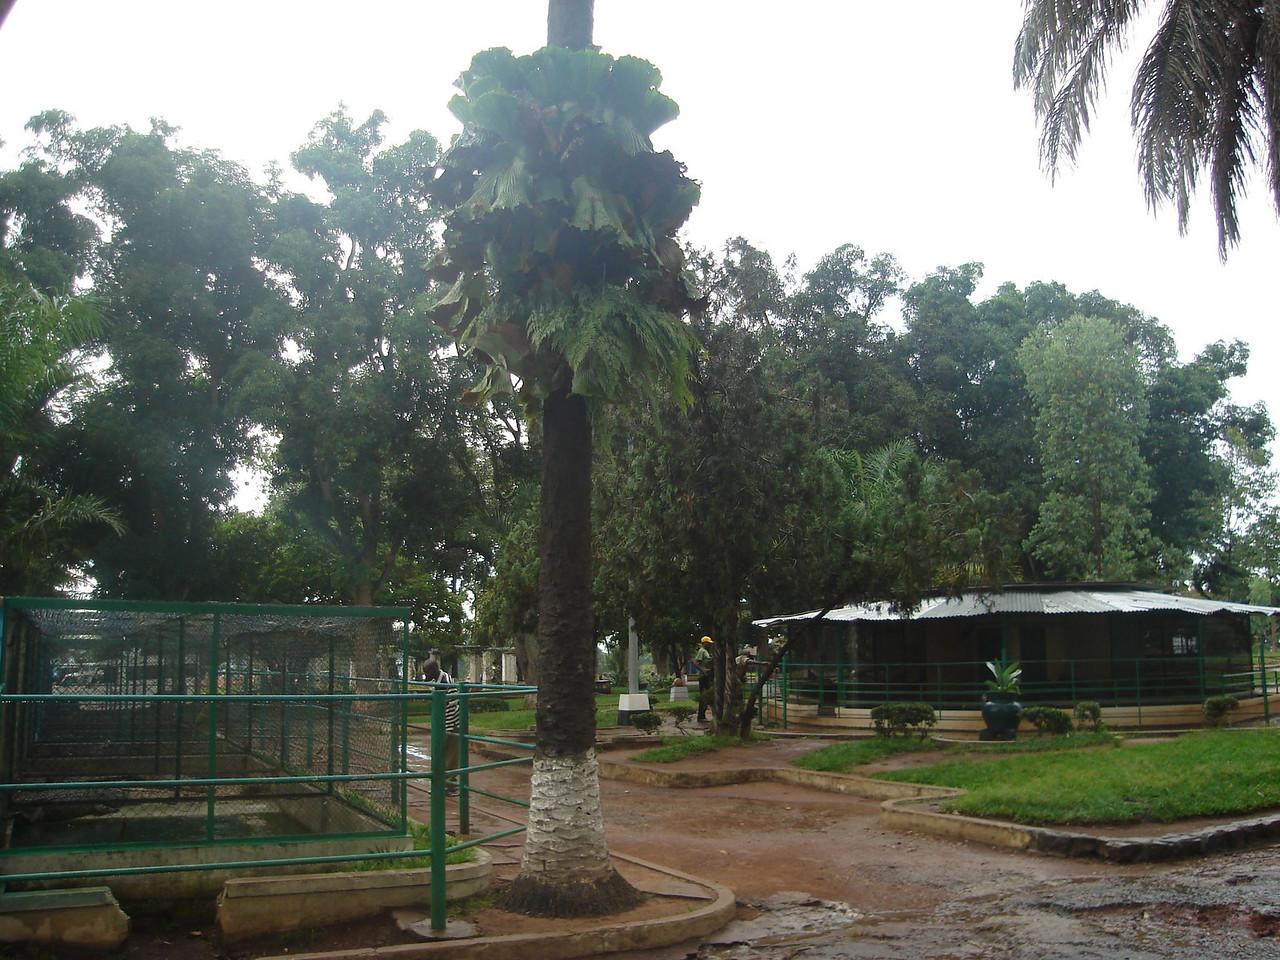 O pequeno zoo junto à K18.